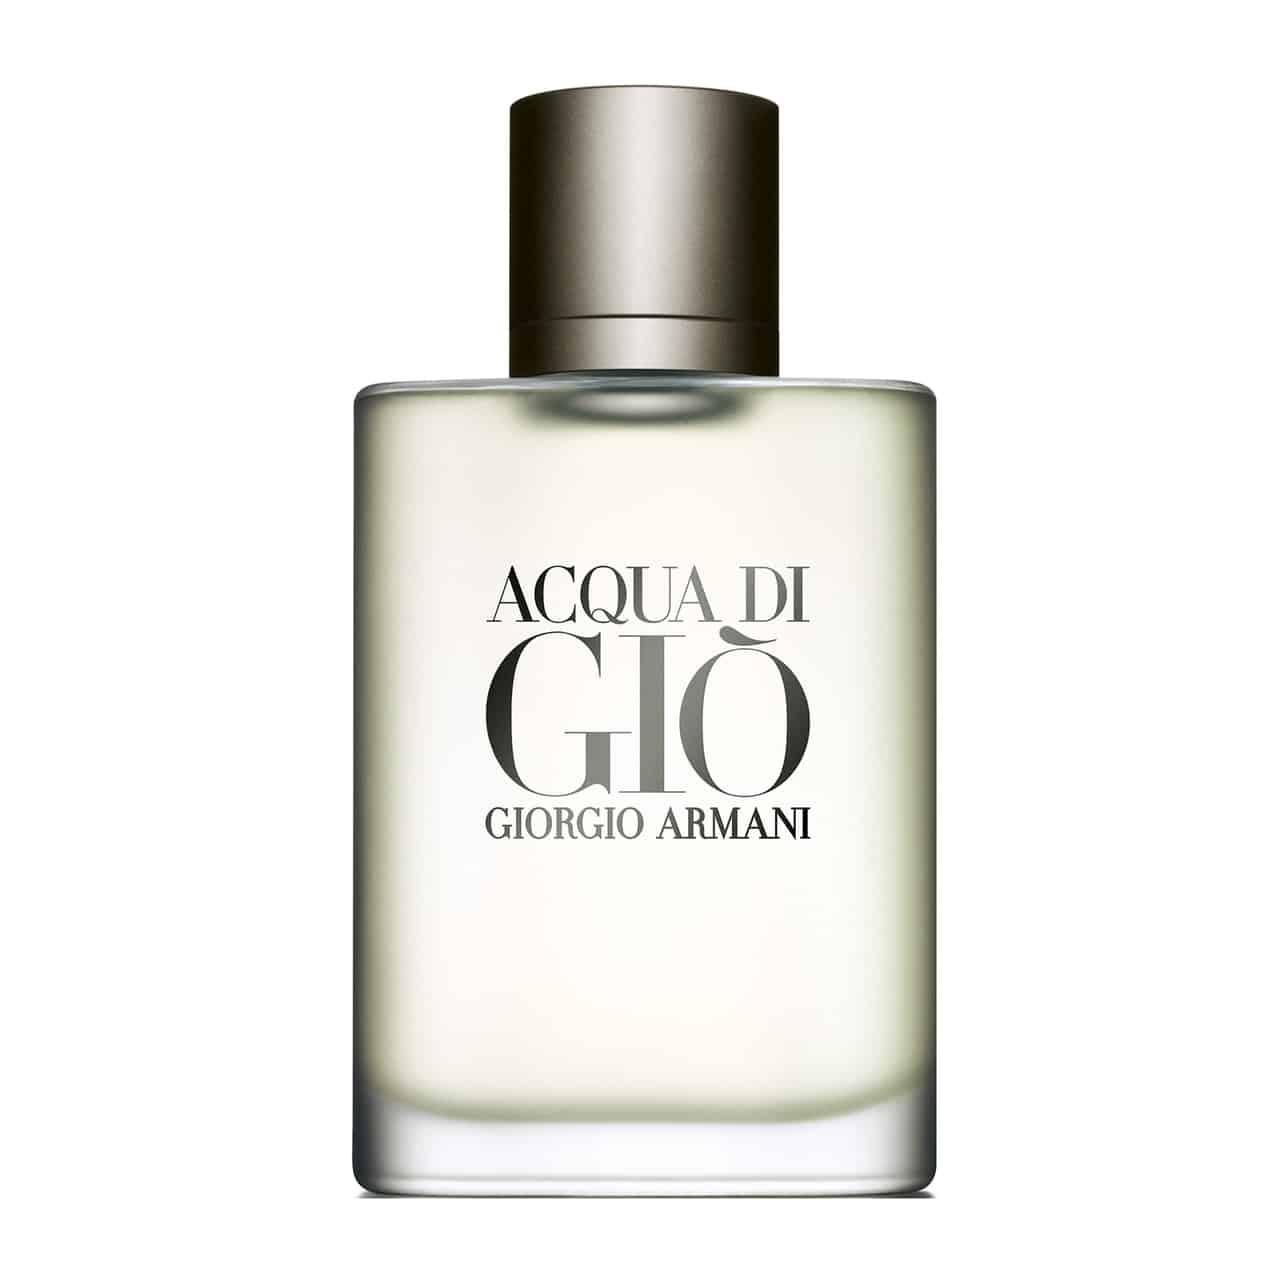 ACQUA DI GIO.GIORGIO - تستر اماراتی ادو تویلت مردانه جورجیو آرمانی مدل Acqua di Gio حجم 100 میلی لیتر